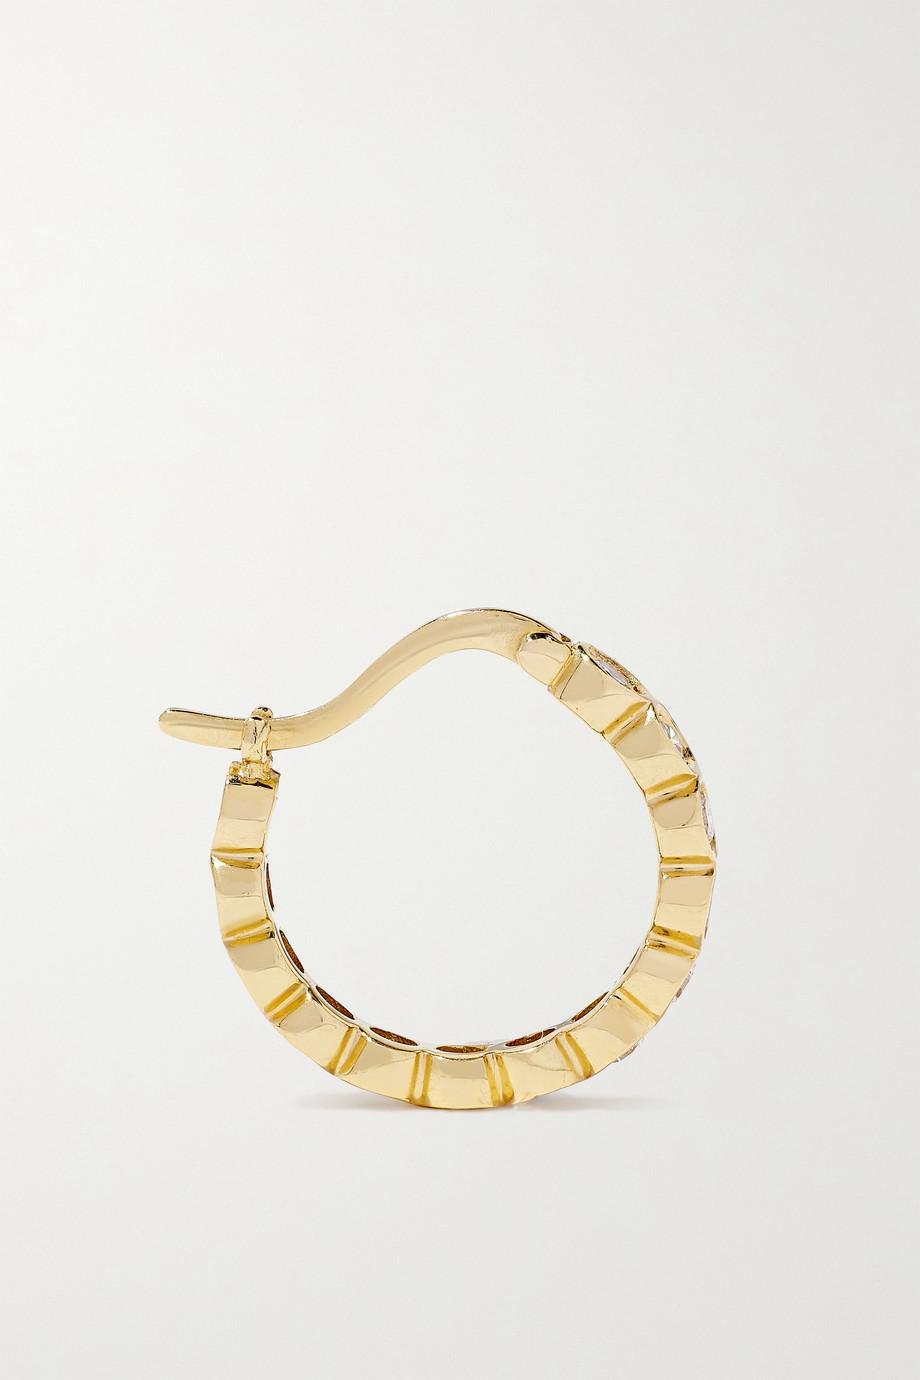 Octavia Elizabeth + NET SUSTAIN Petite Chloe Creolen aus recyceltem 18 Karat Gold mit Diamanten